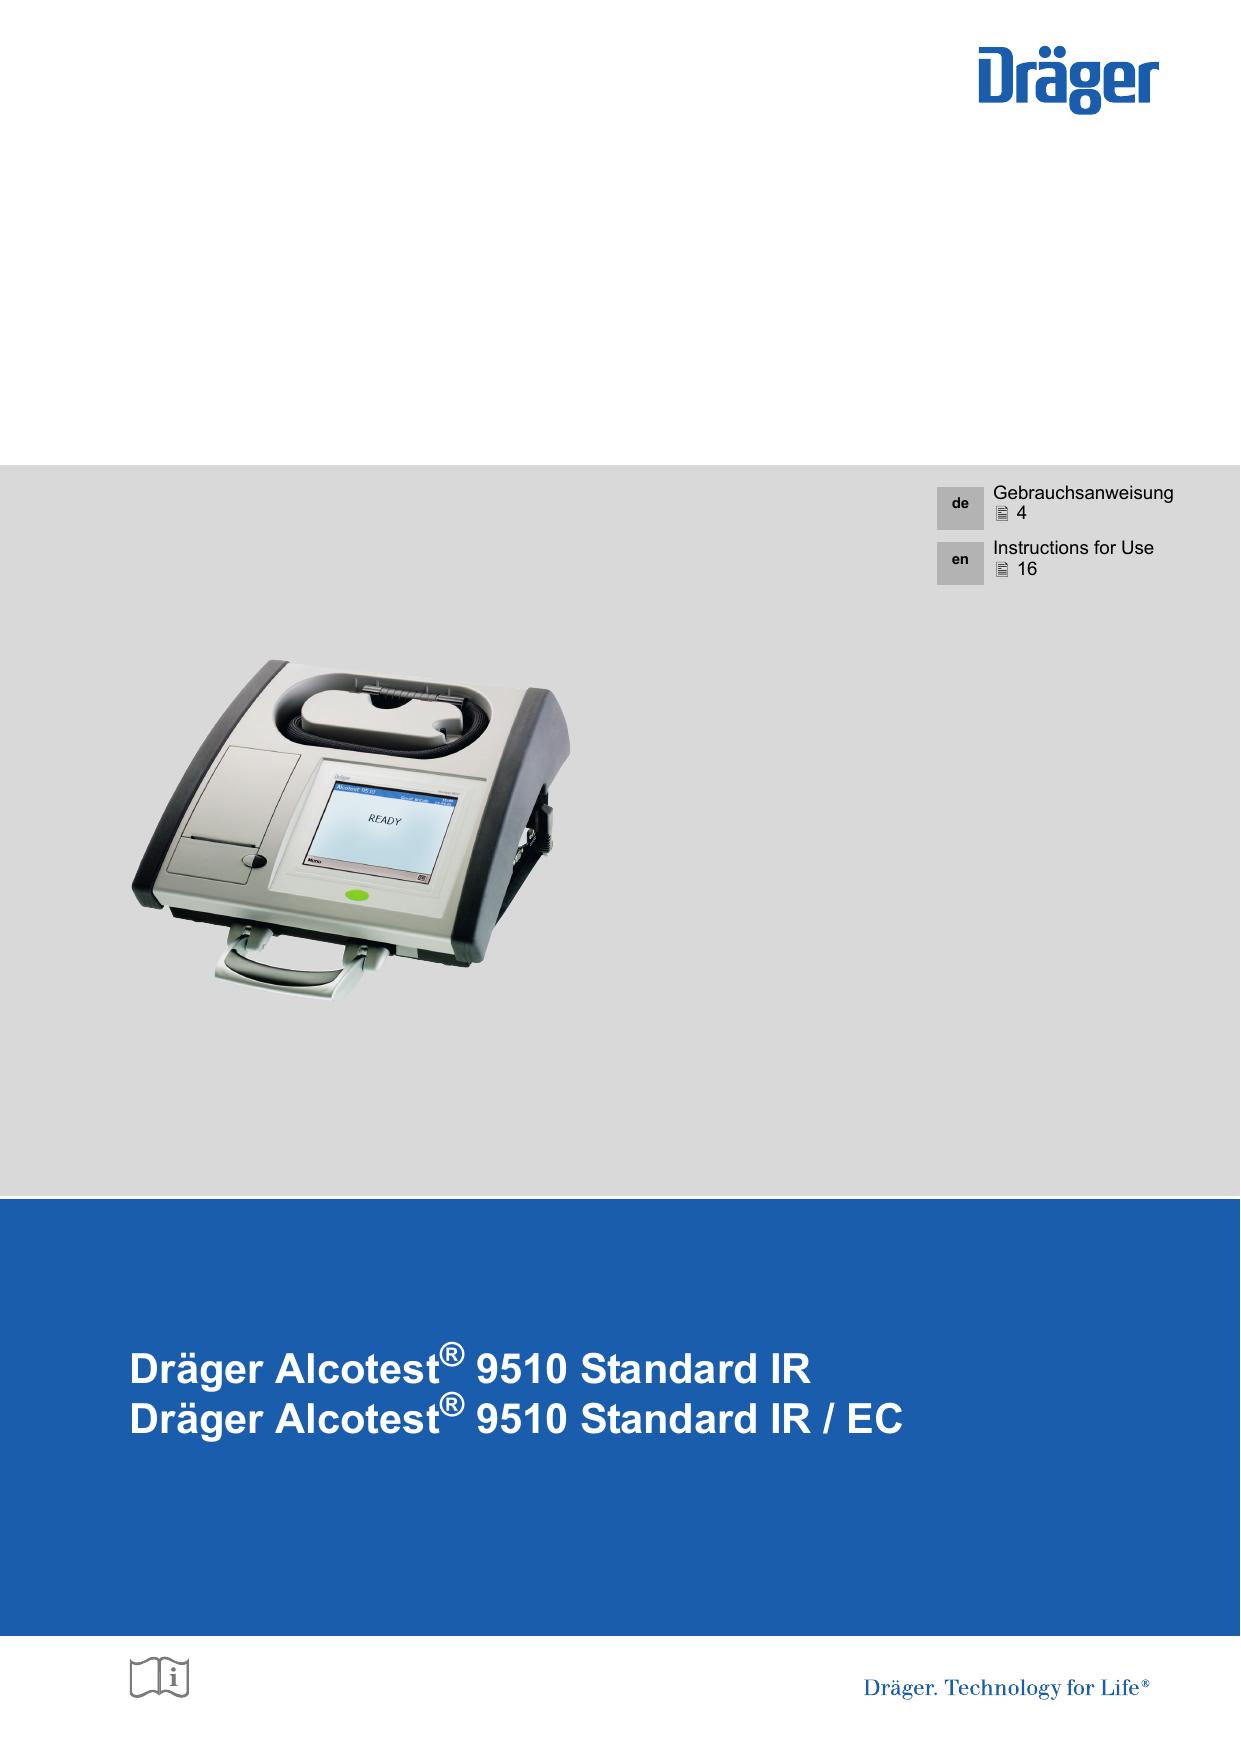 draeger alcotest 9510 manual professional user manual ebooks u2022 rh justusermanual today Draeger Interlock Inc Alcotest 5000 Draeger